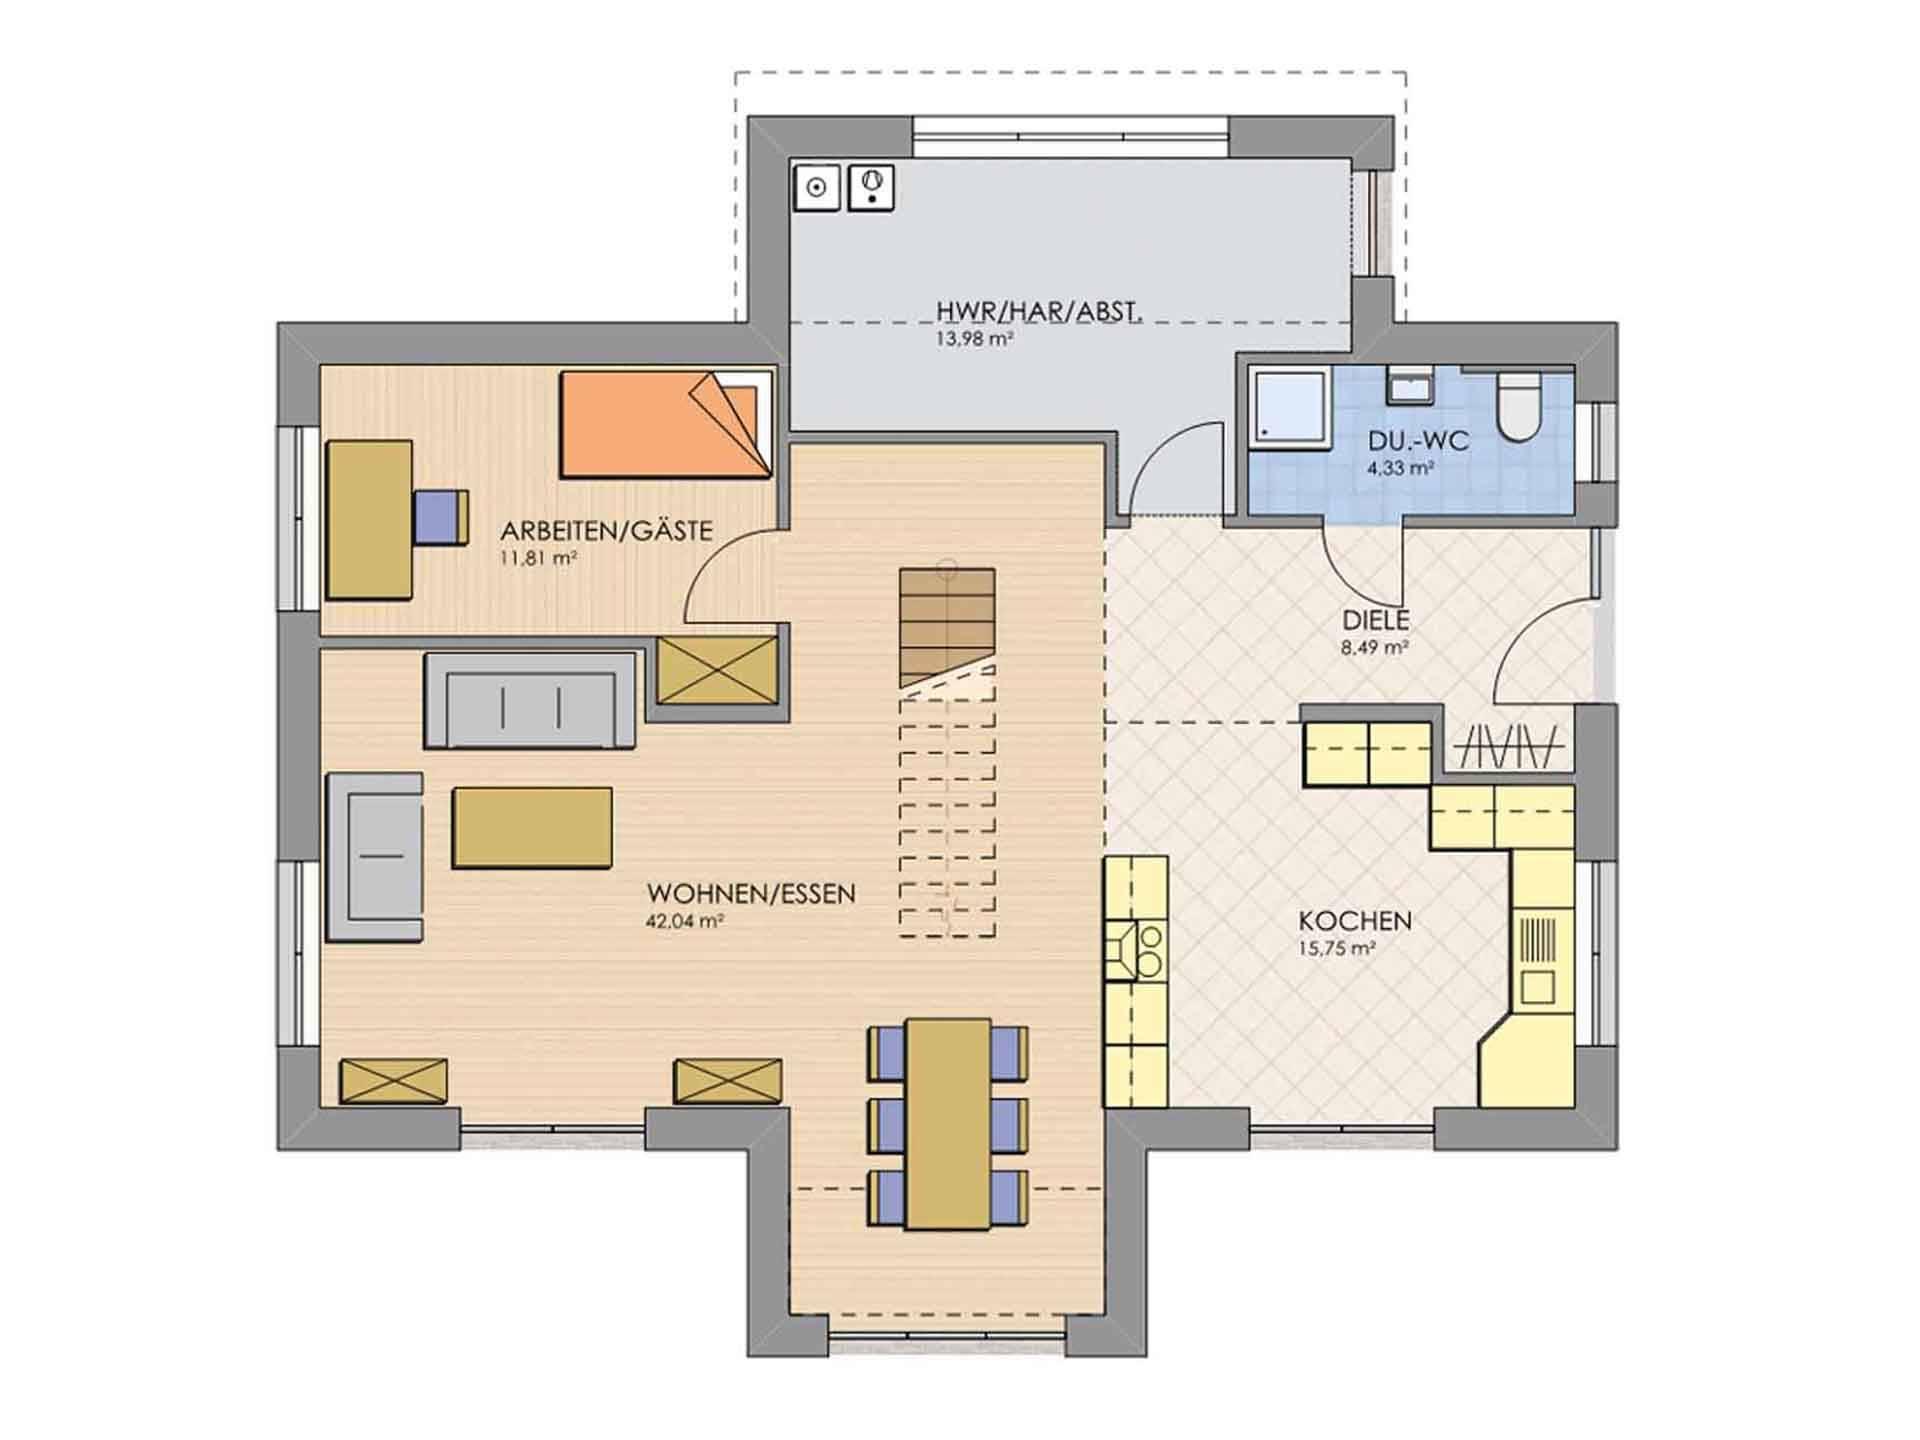 Grundriss Erdgeschoss Haus MODERN 174 von AP:art Haus GmbH